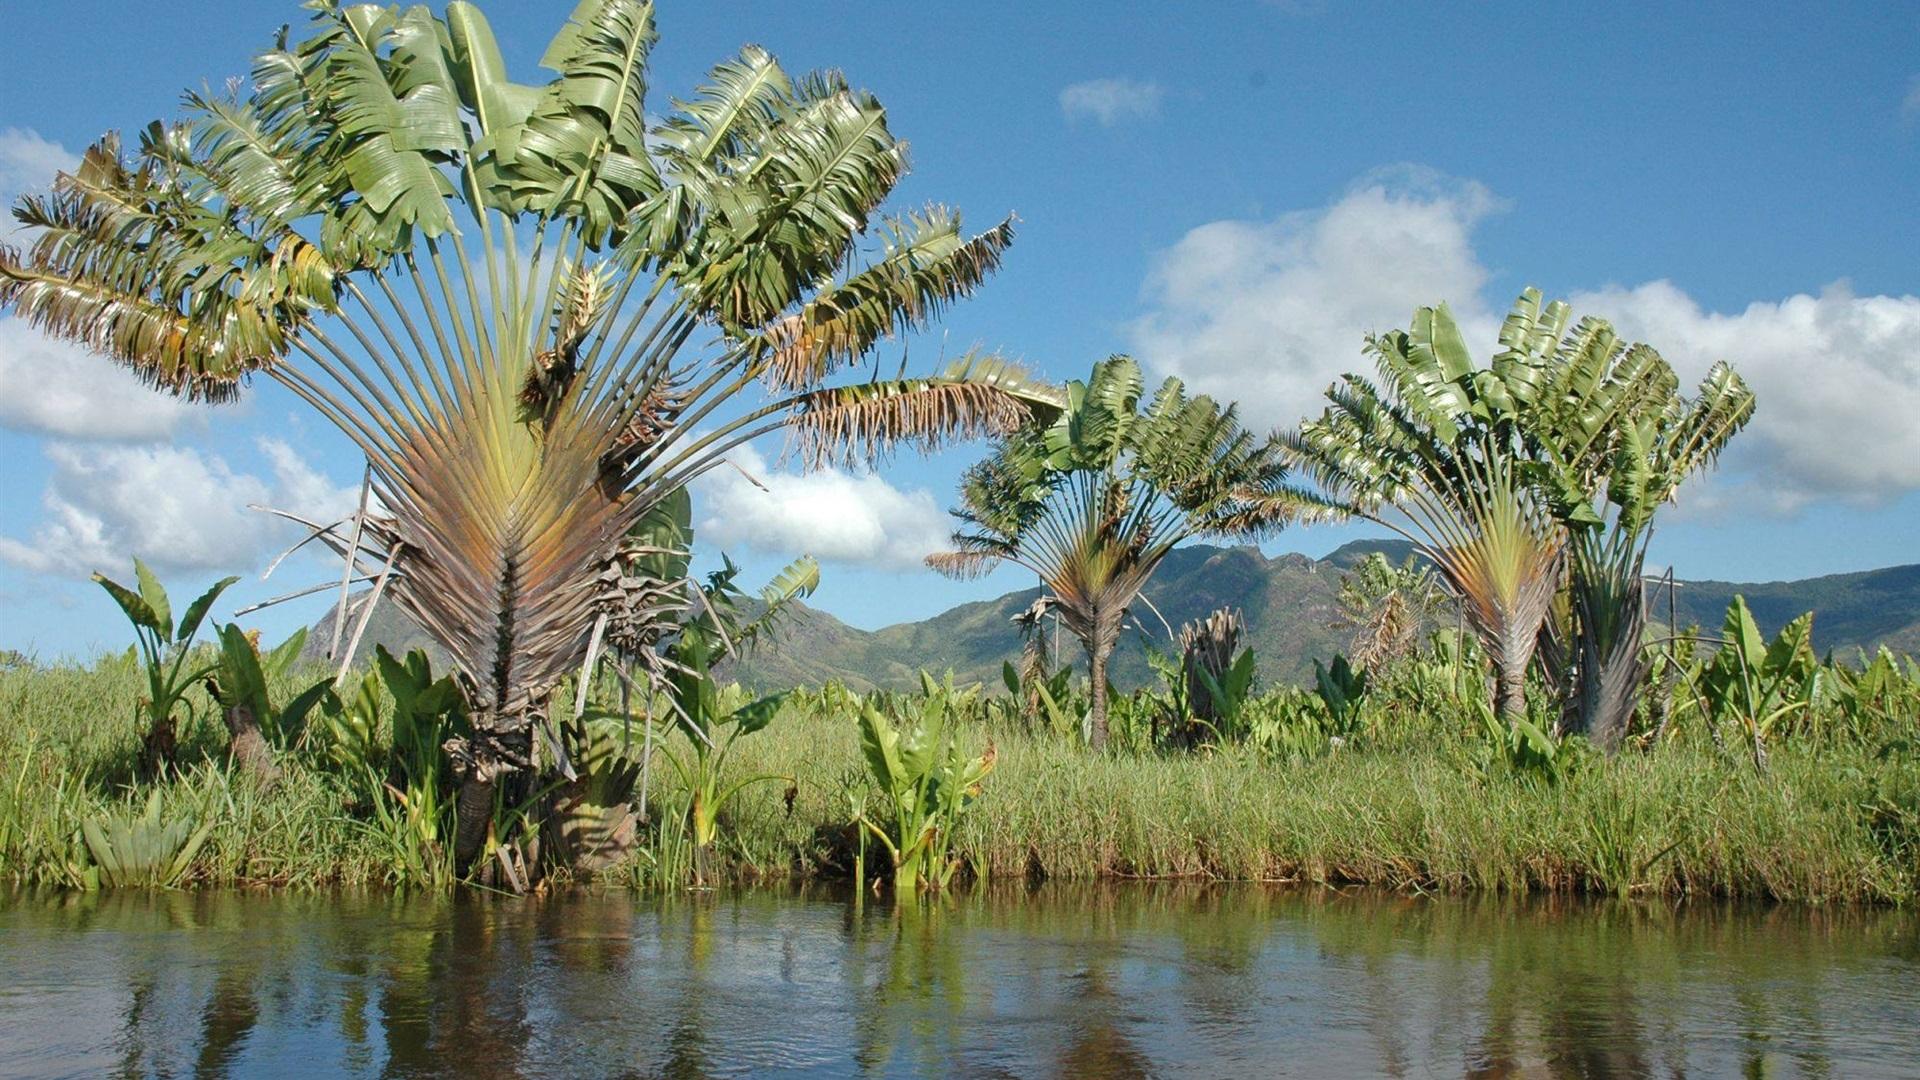 Fondos De Pantalla Palmeras Ravinala Río Madagascar